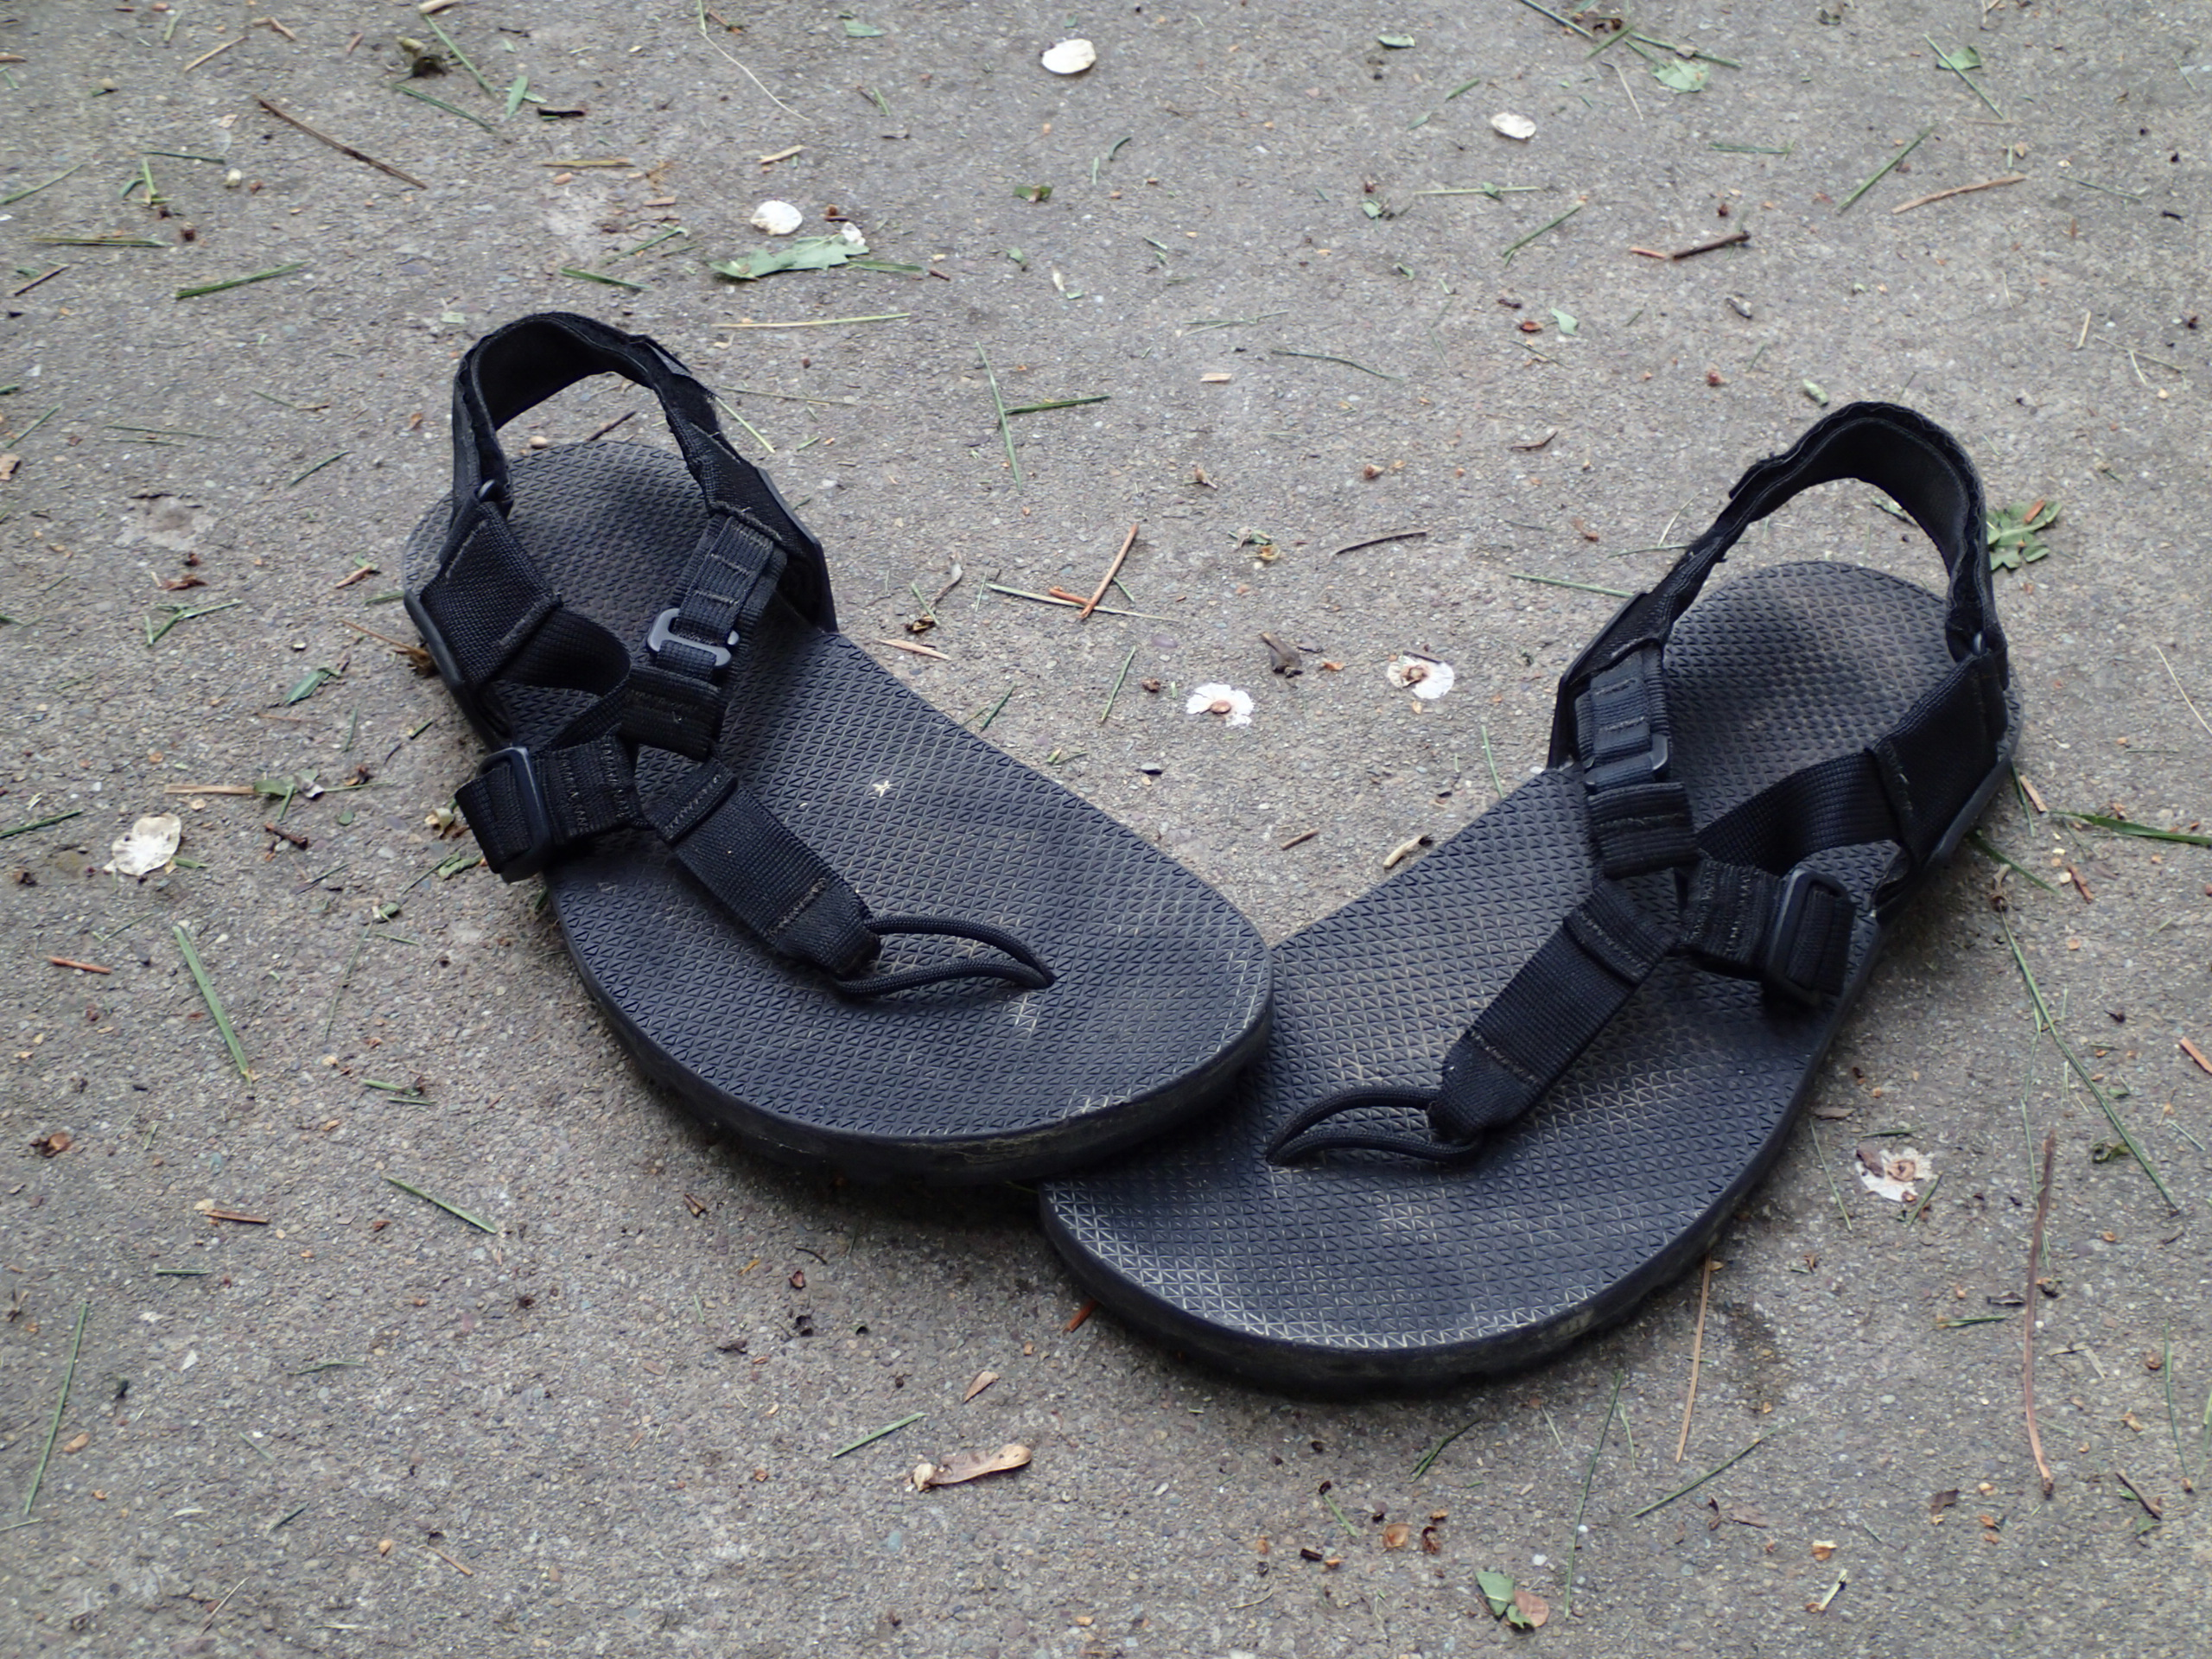 1b93c6dd0bb9ee Gear Review  Bedrock Cairn Minimalist Sandals - The Trek